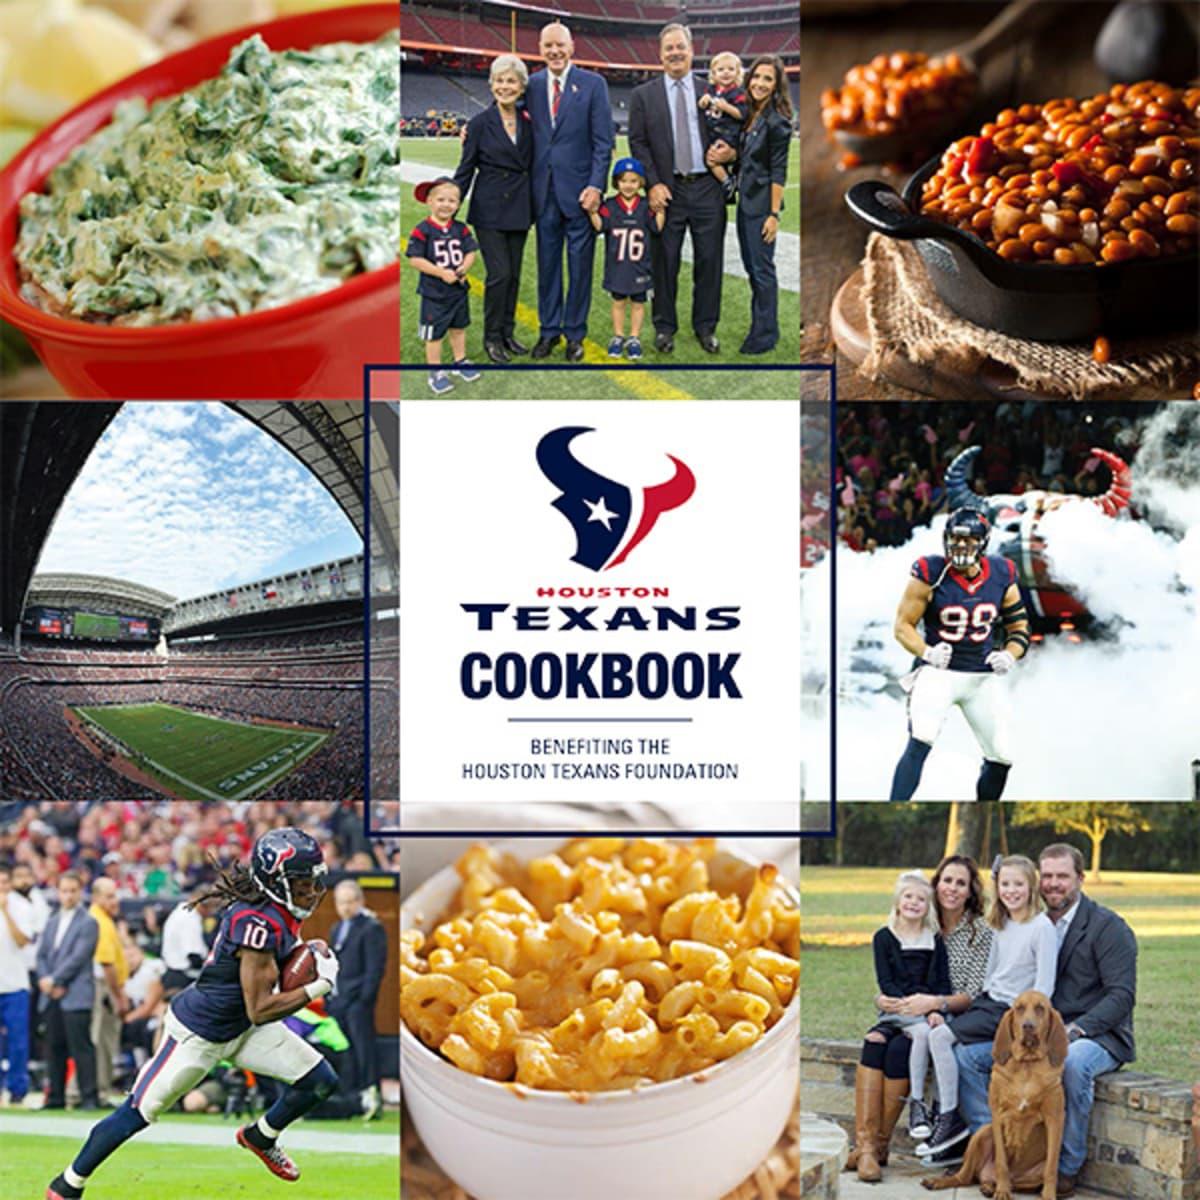 Houston Texans Cookbook cover